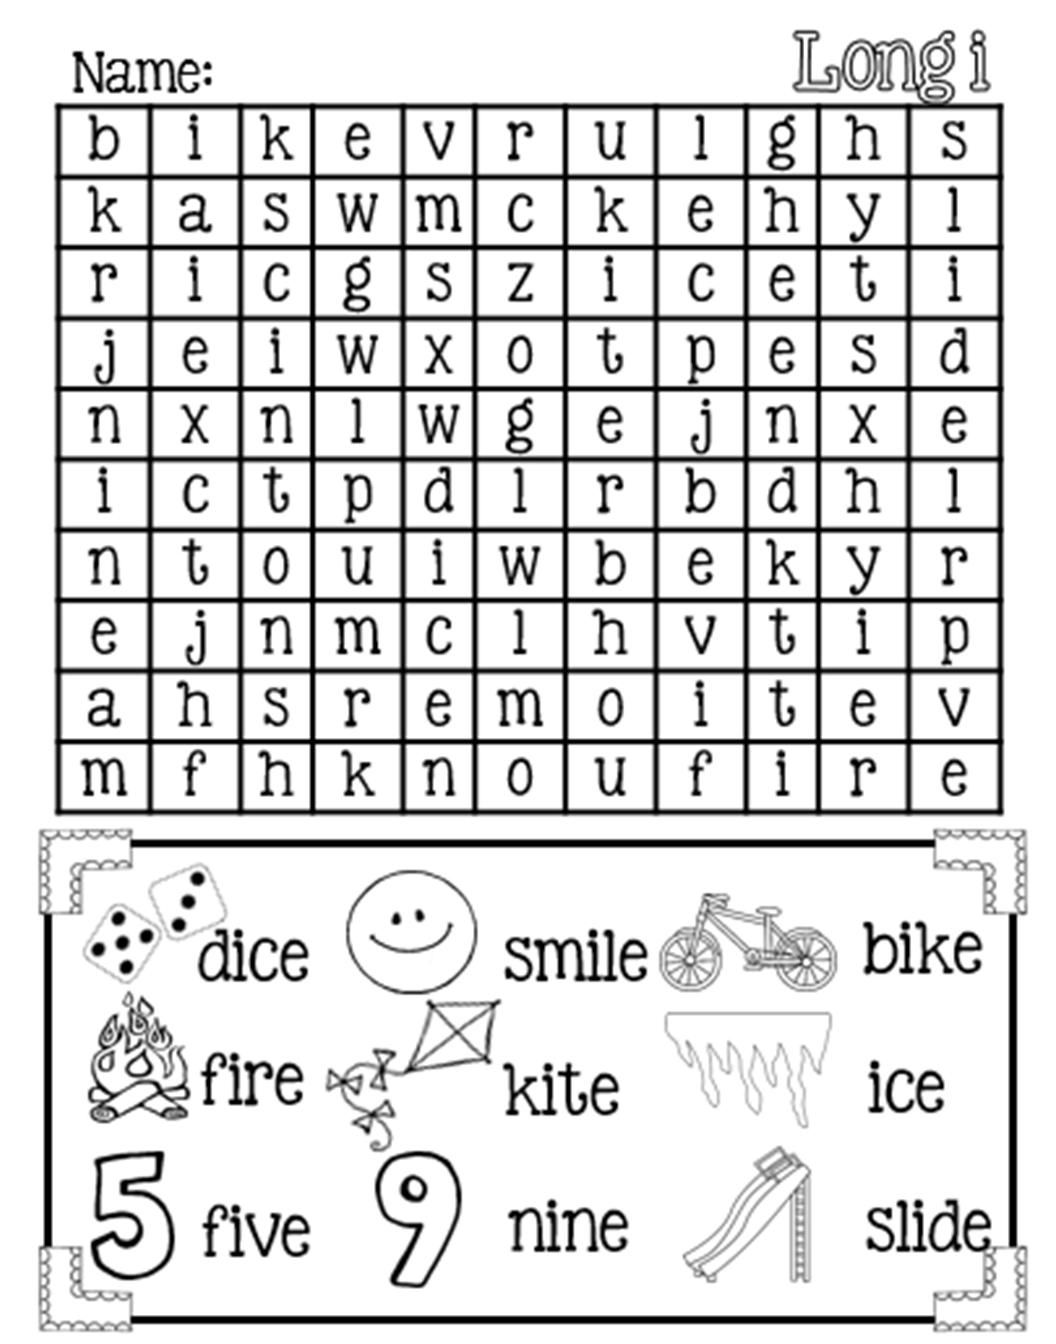 Magic E Long I Word Search {Free} | Elementary Classroom | Long I | Magic E Worksheets Free Printable